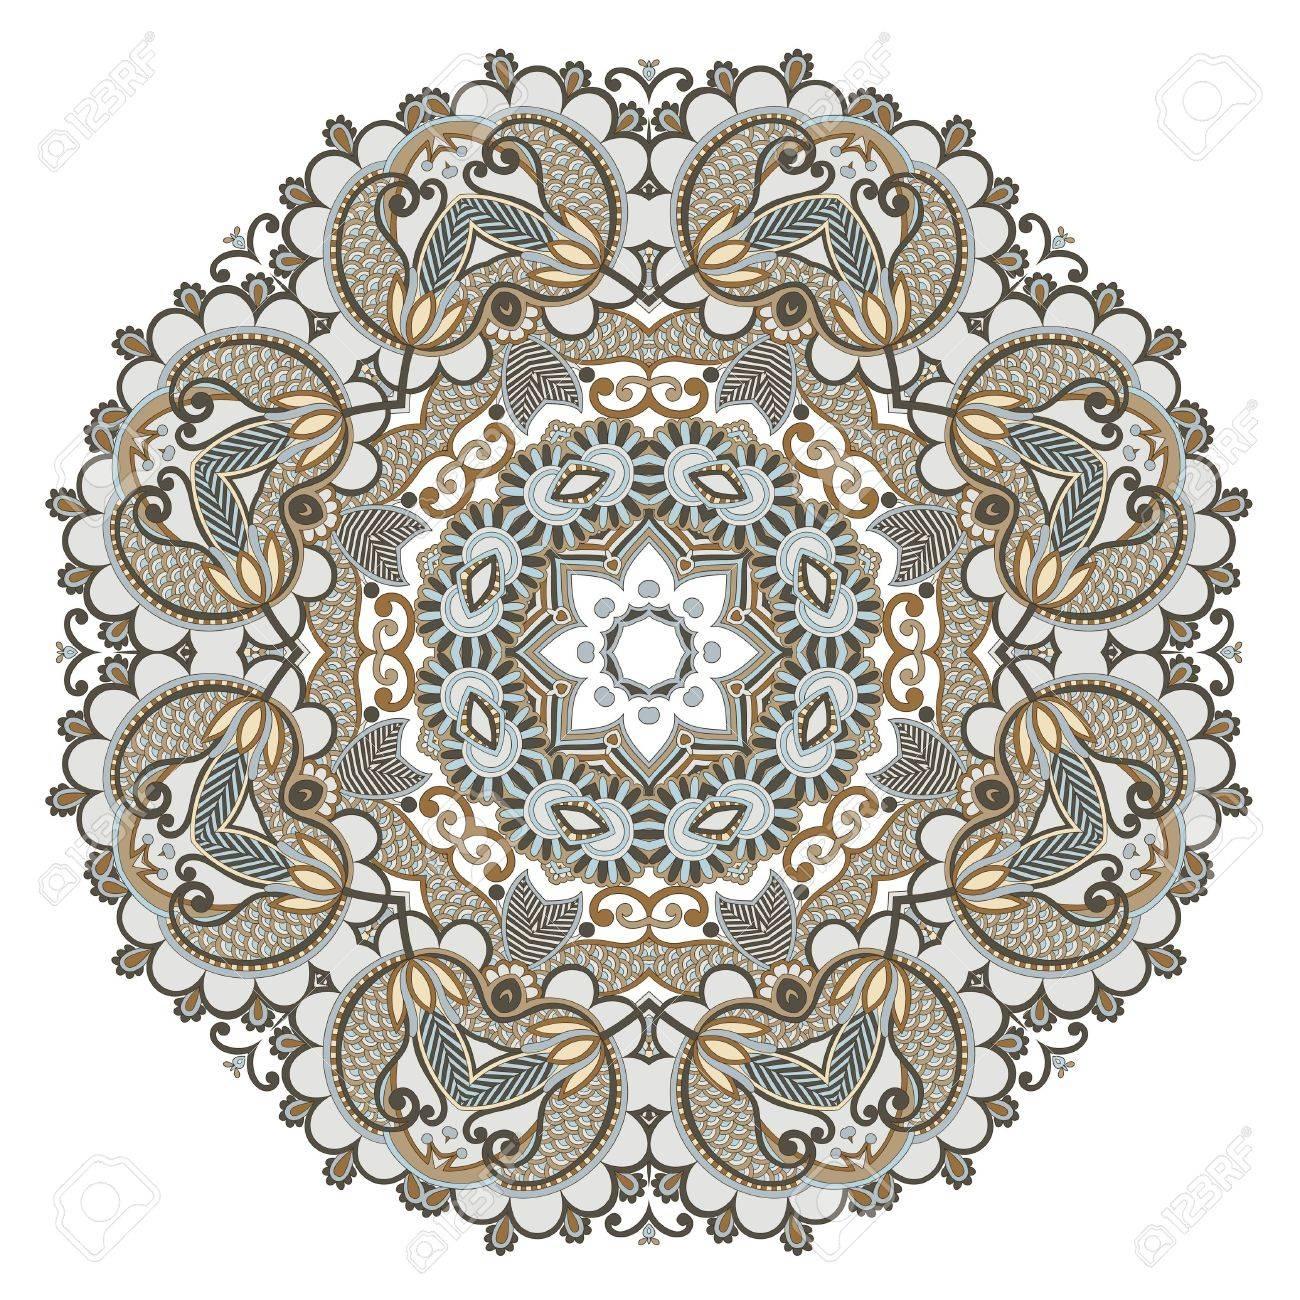 Circle ornament, ornamental round lace Stock Vector - 13440372